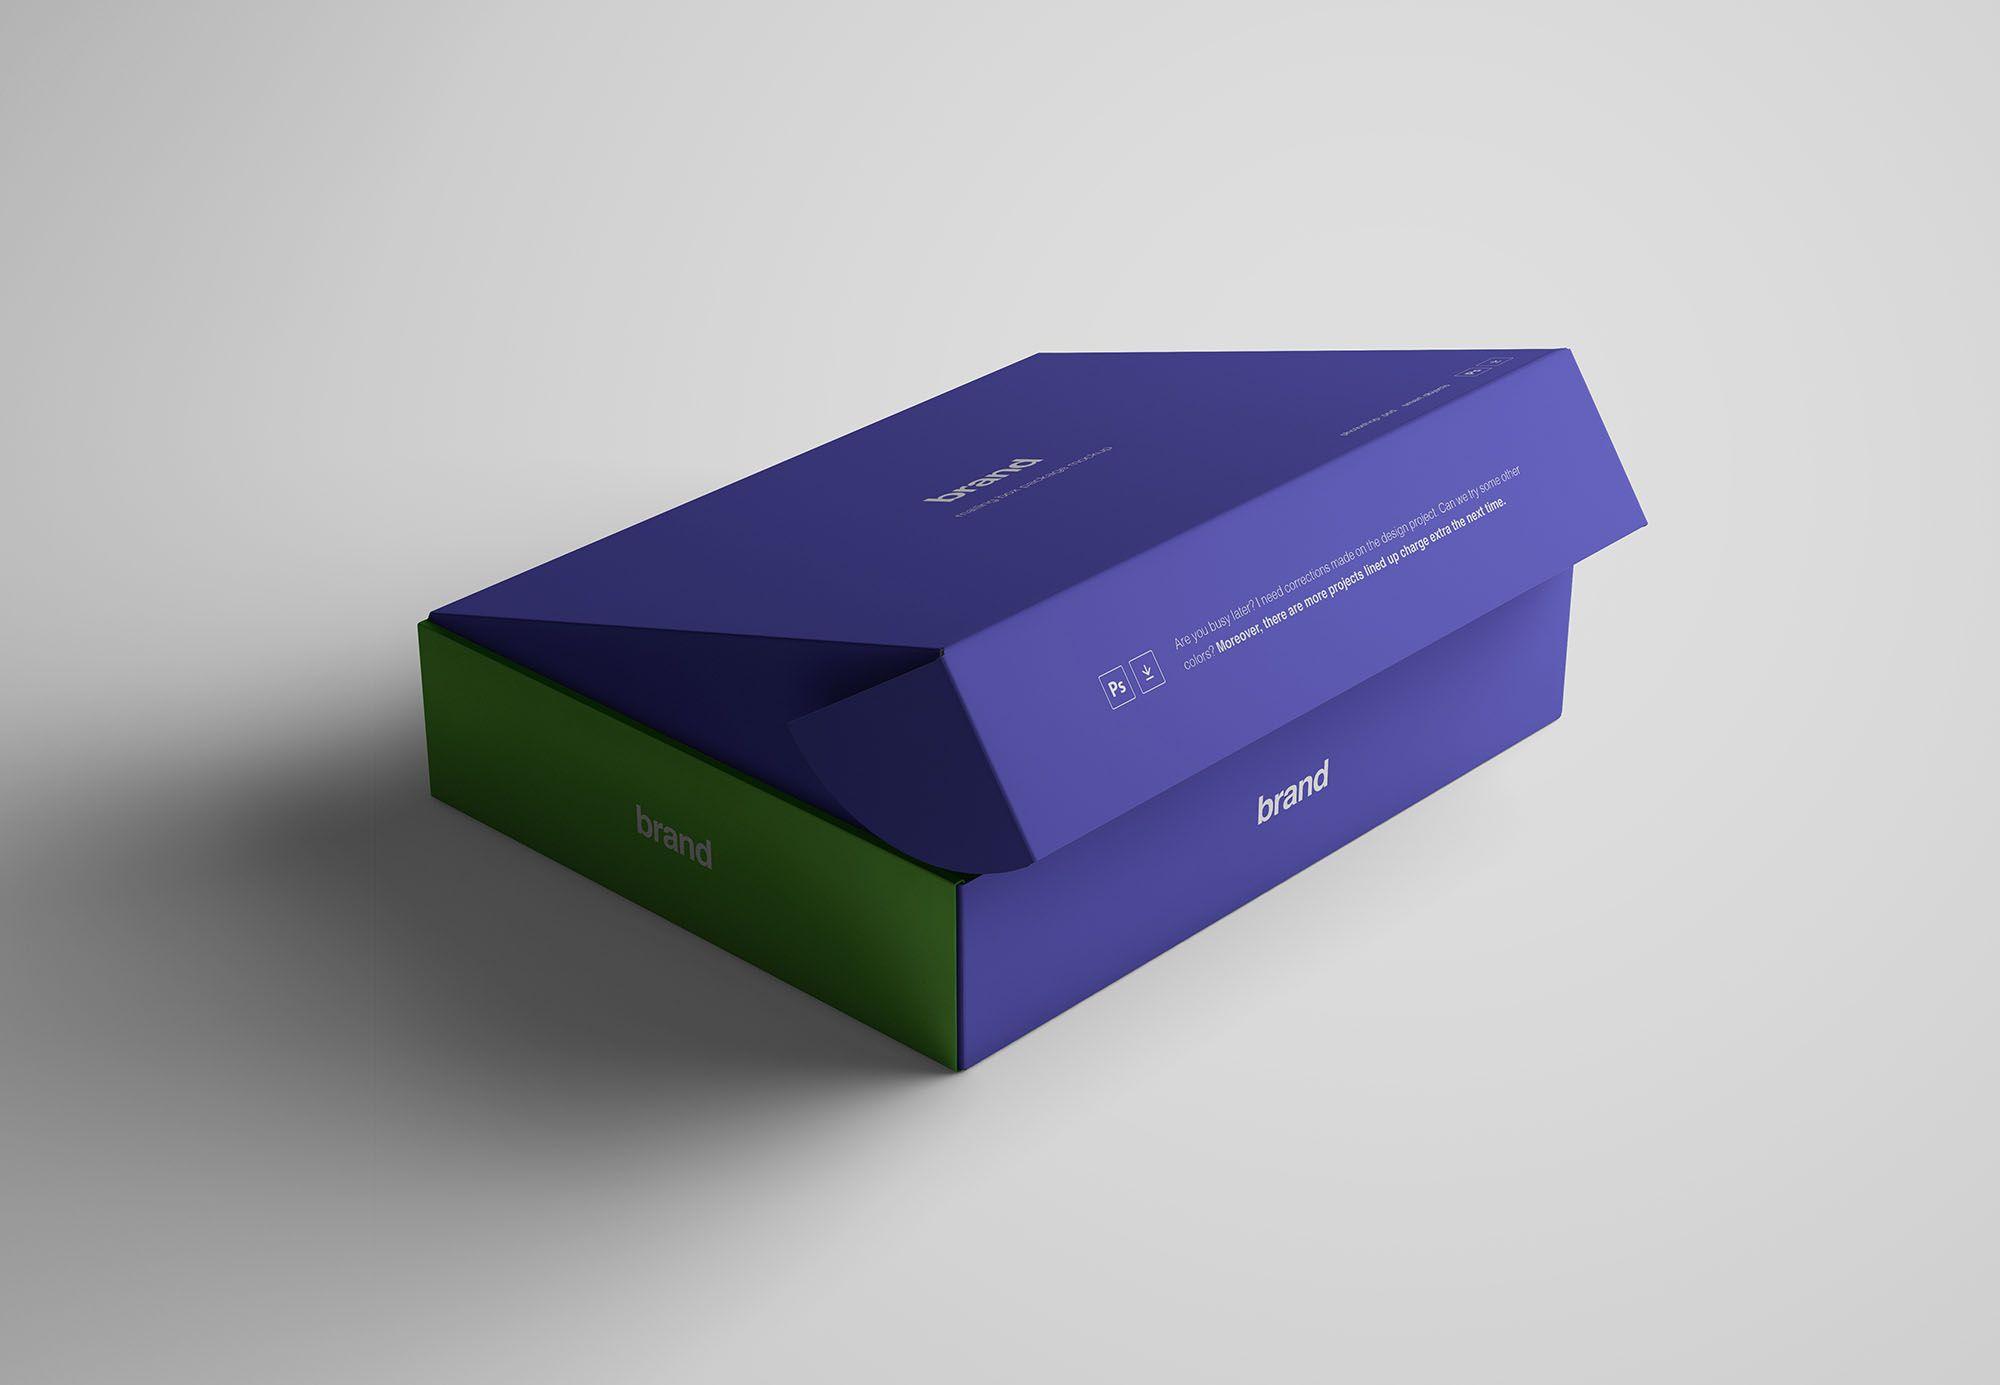 Graphic Pear Advanced Package Box Moxkup Box Mockup Box Design Box Packaging